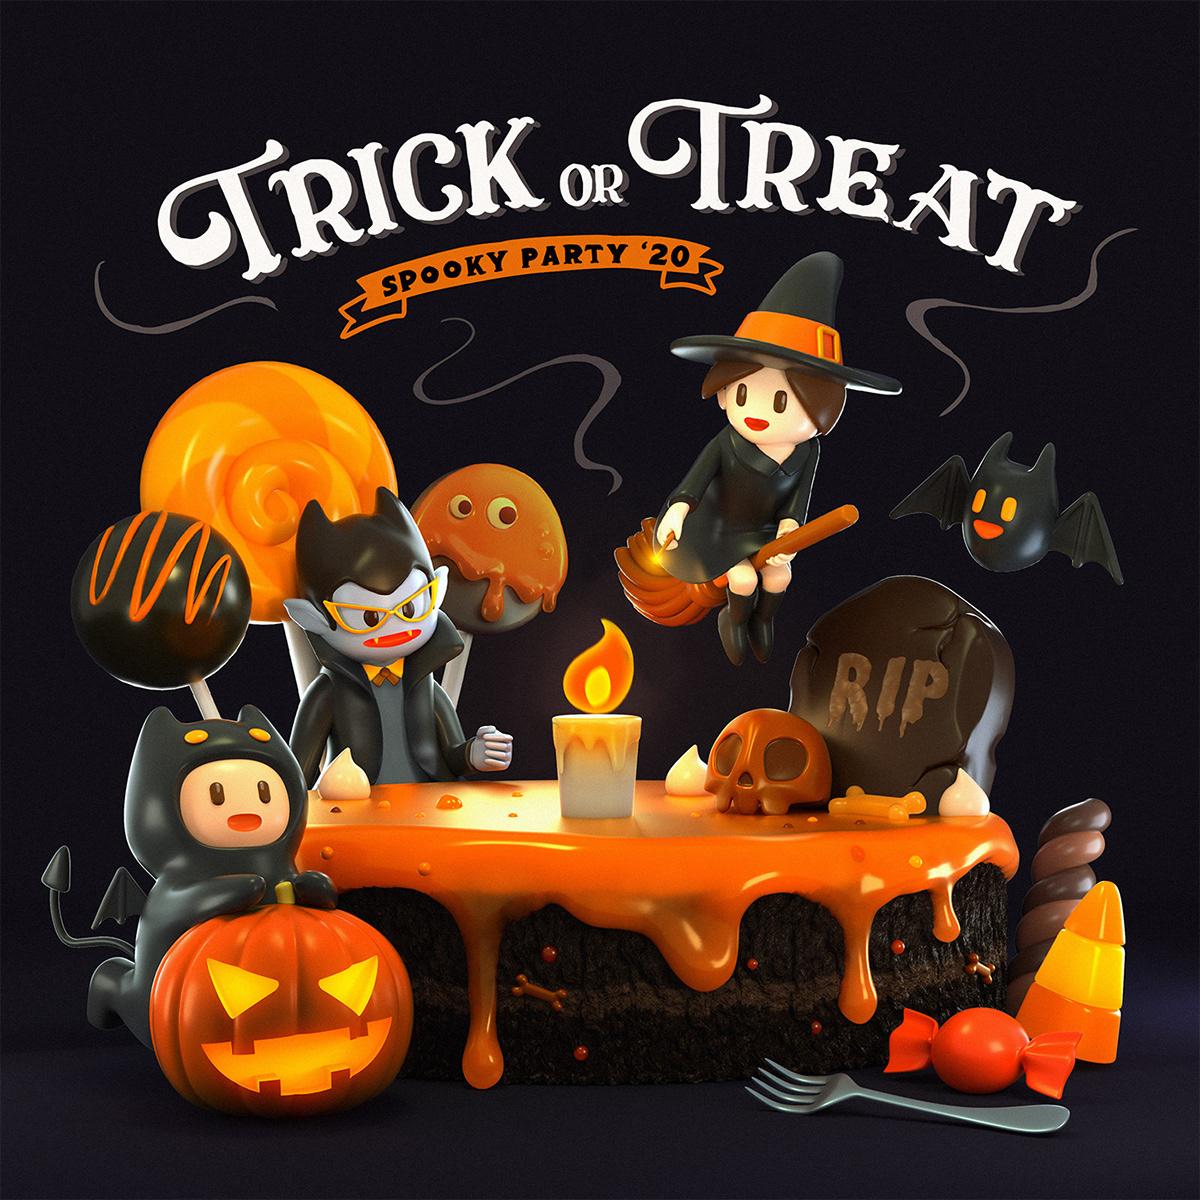 Image may contain: cartoon, pumpkin and halloween